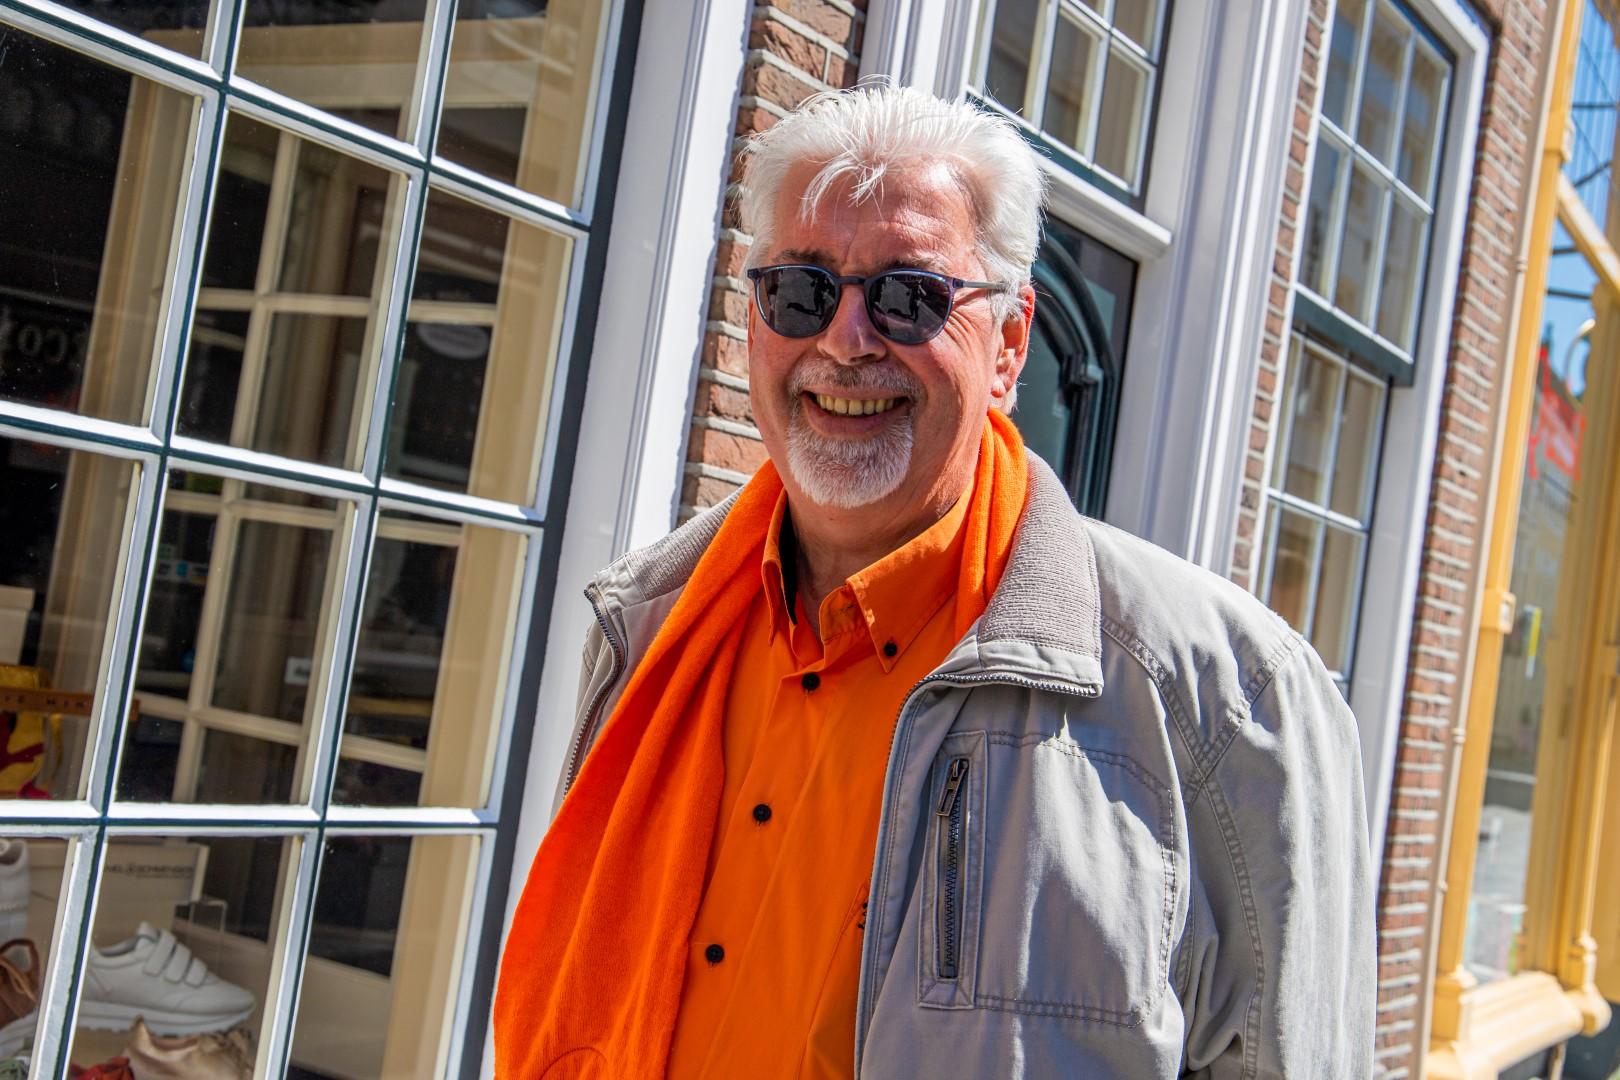 koningsdag 2021 kingsday woningsdag oranje 27 april vlag man